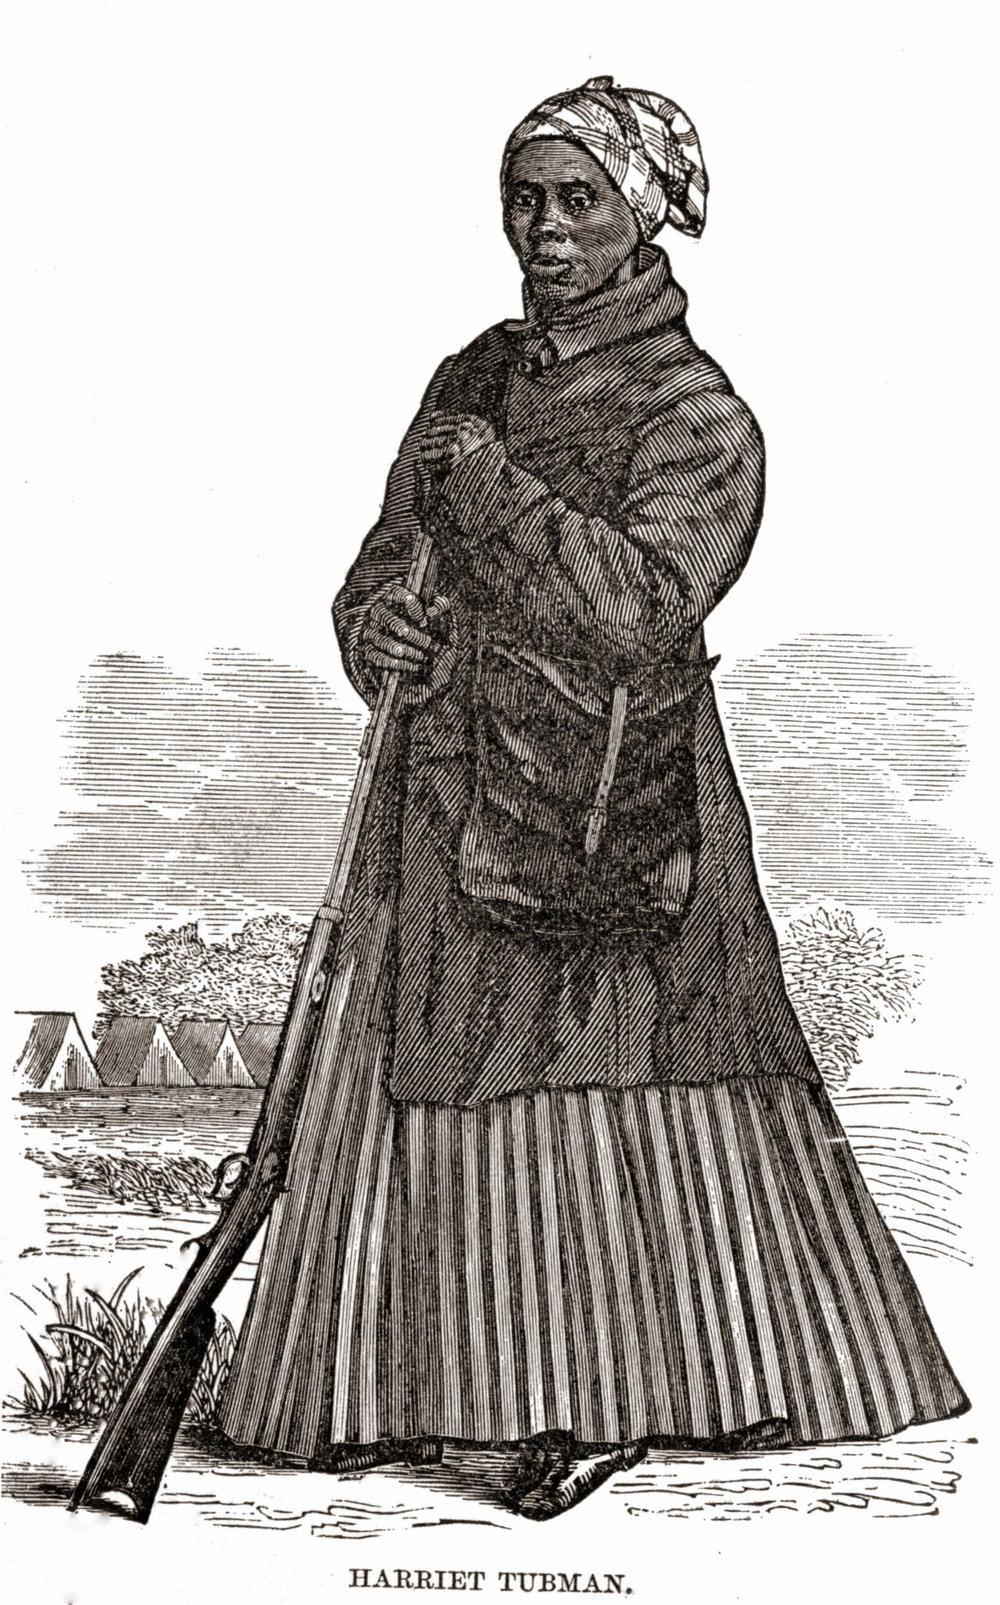 Tubman_Woodcut_1869i#203A71.jpg